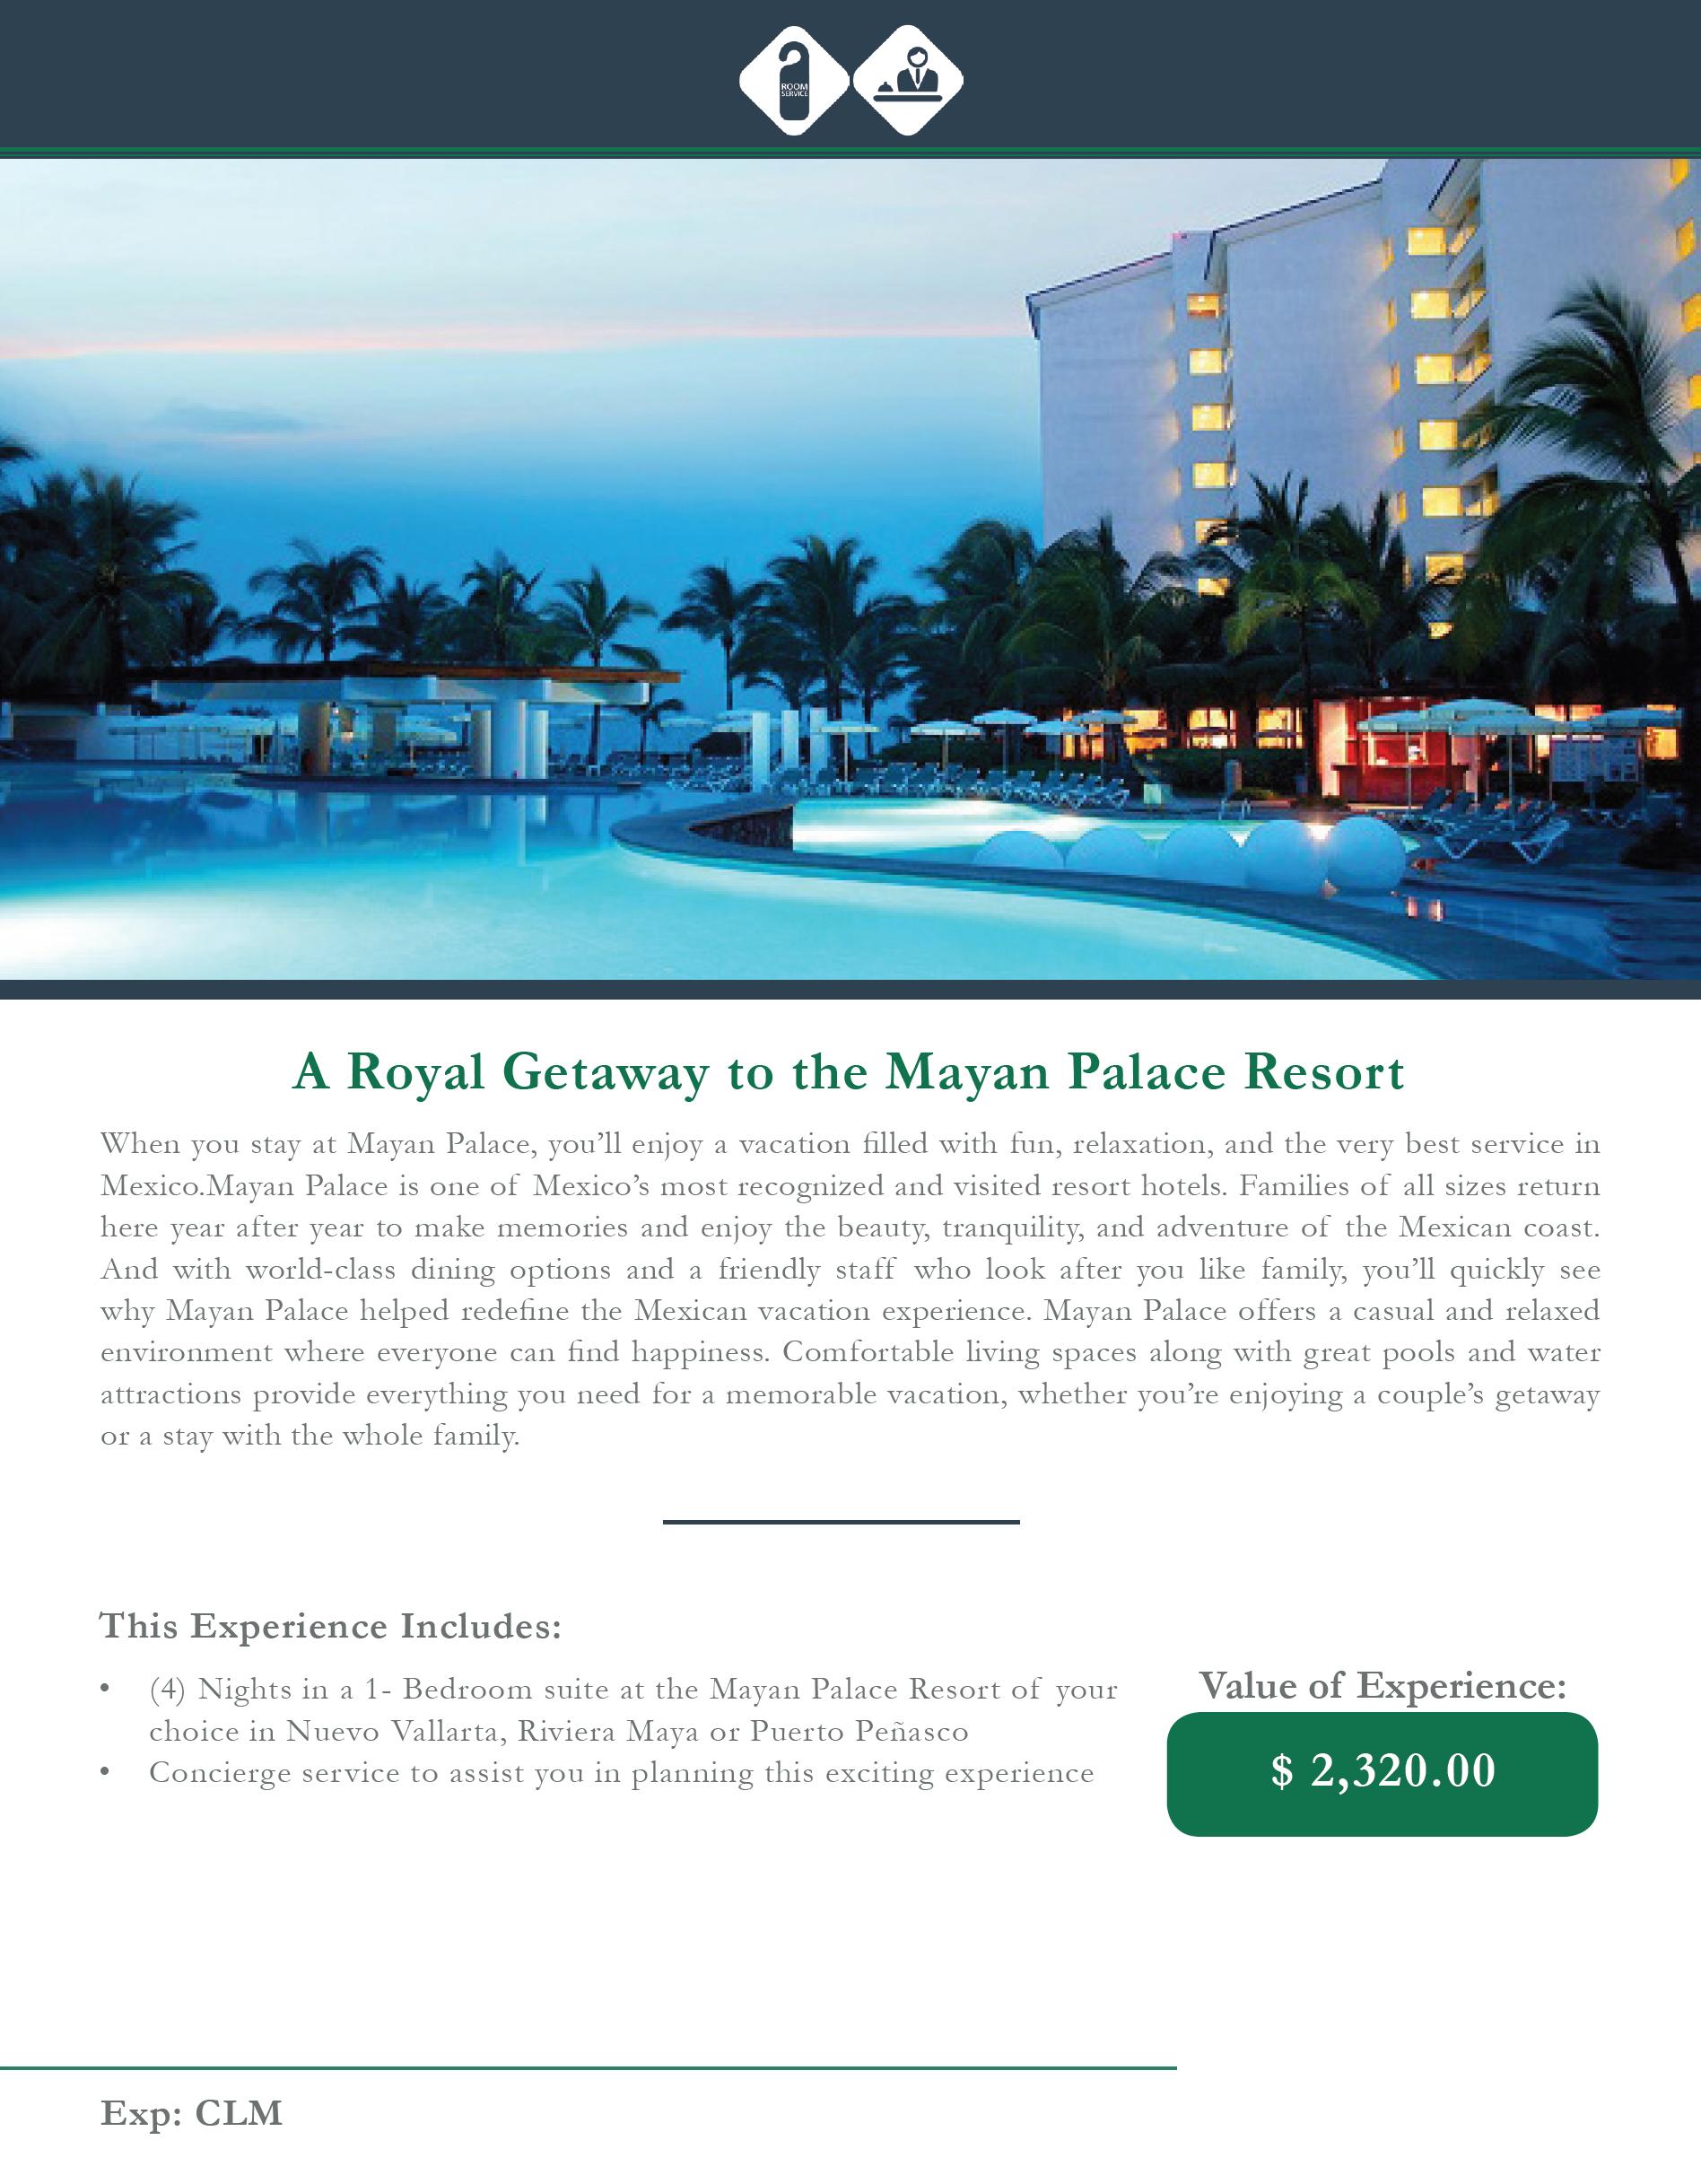 A Royal Getaway to the Mayan Palace